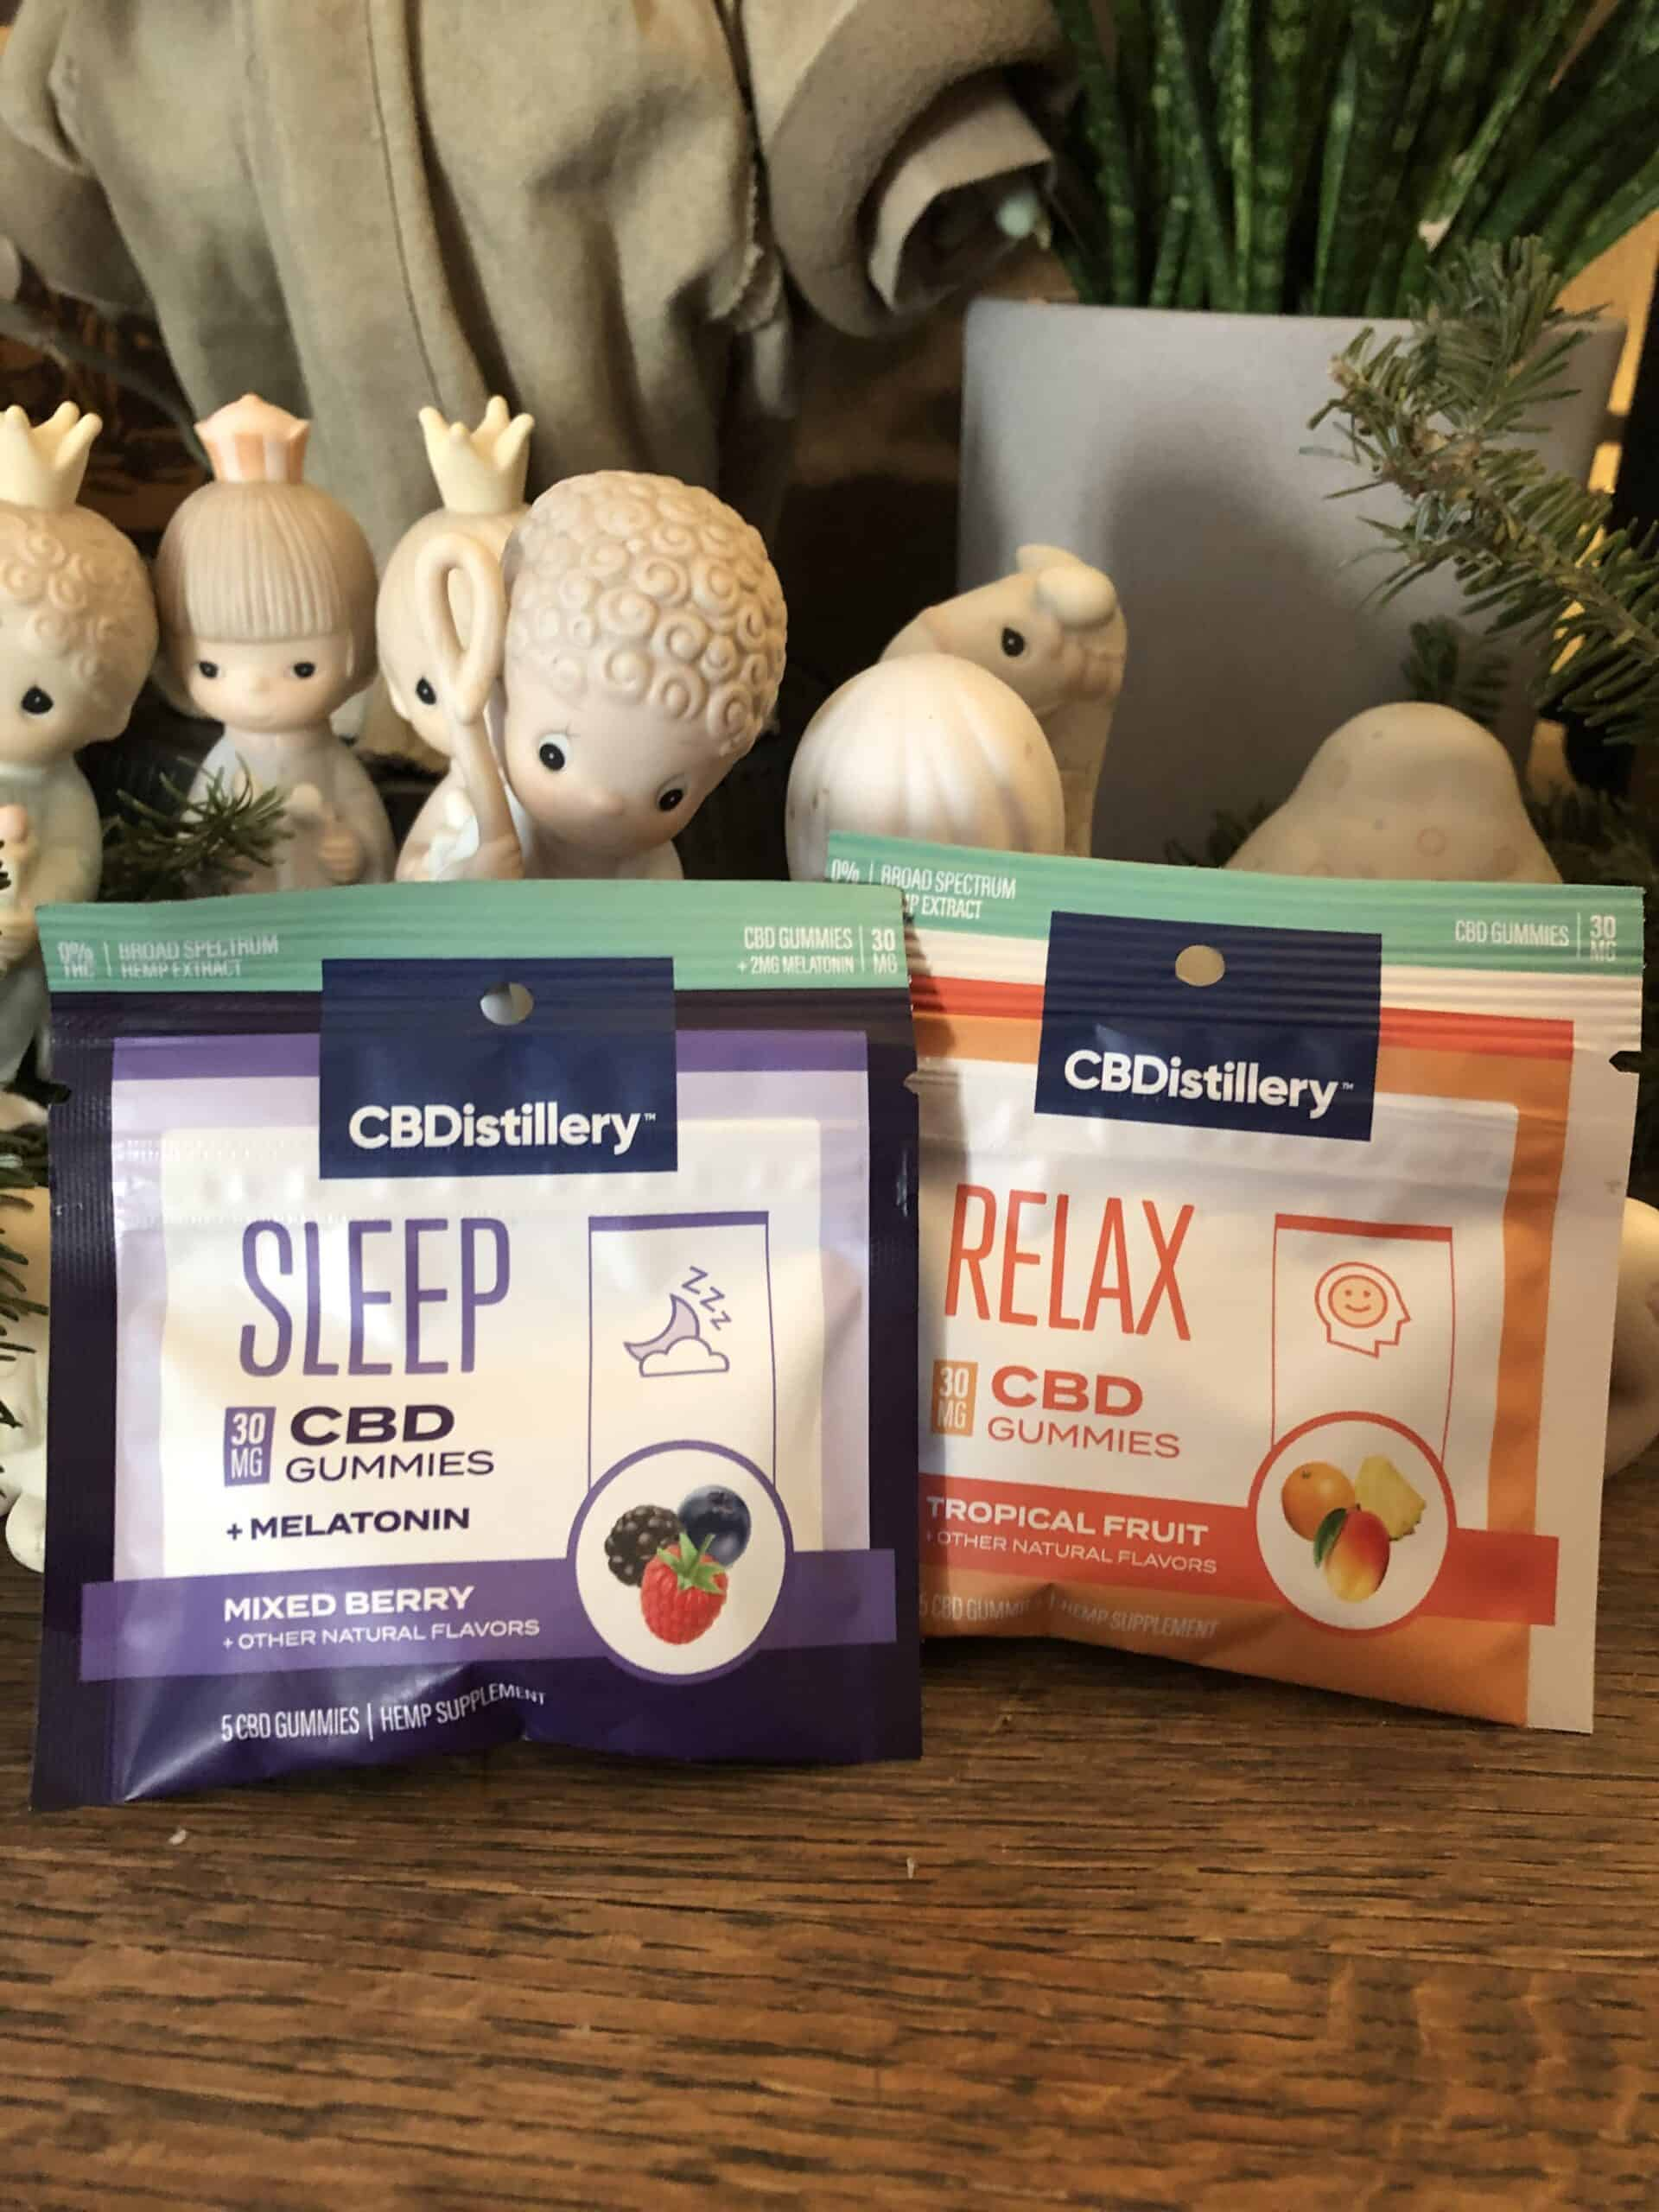 Cbdistillery Sleep Gummies Save On Cannabis Review Beauty Shot